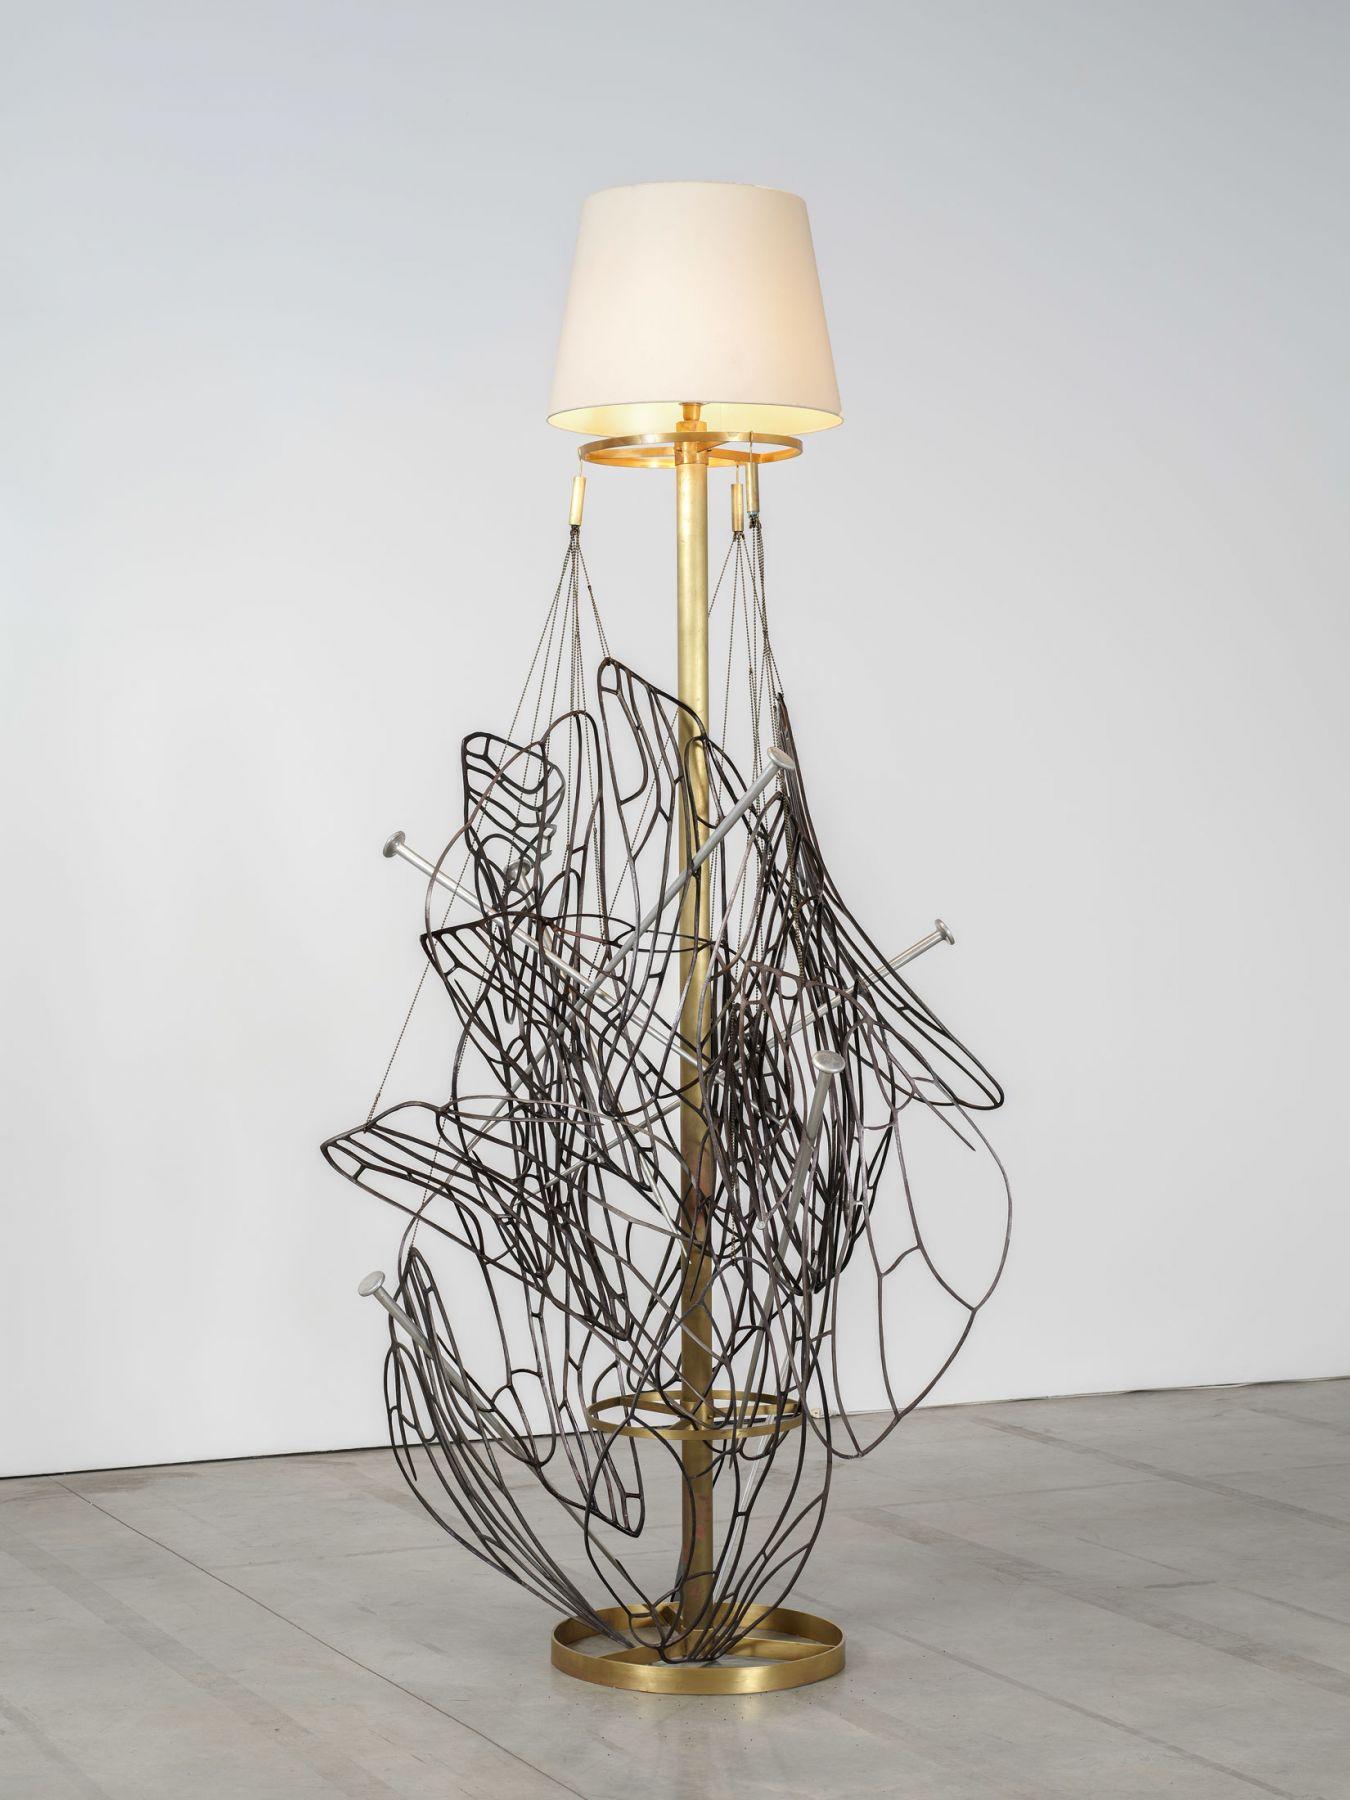 Tunga, Revolution, 2007